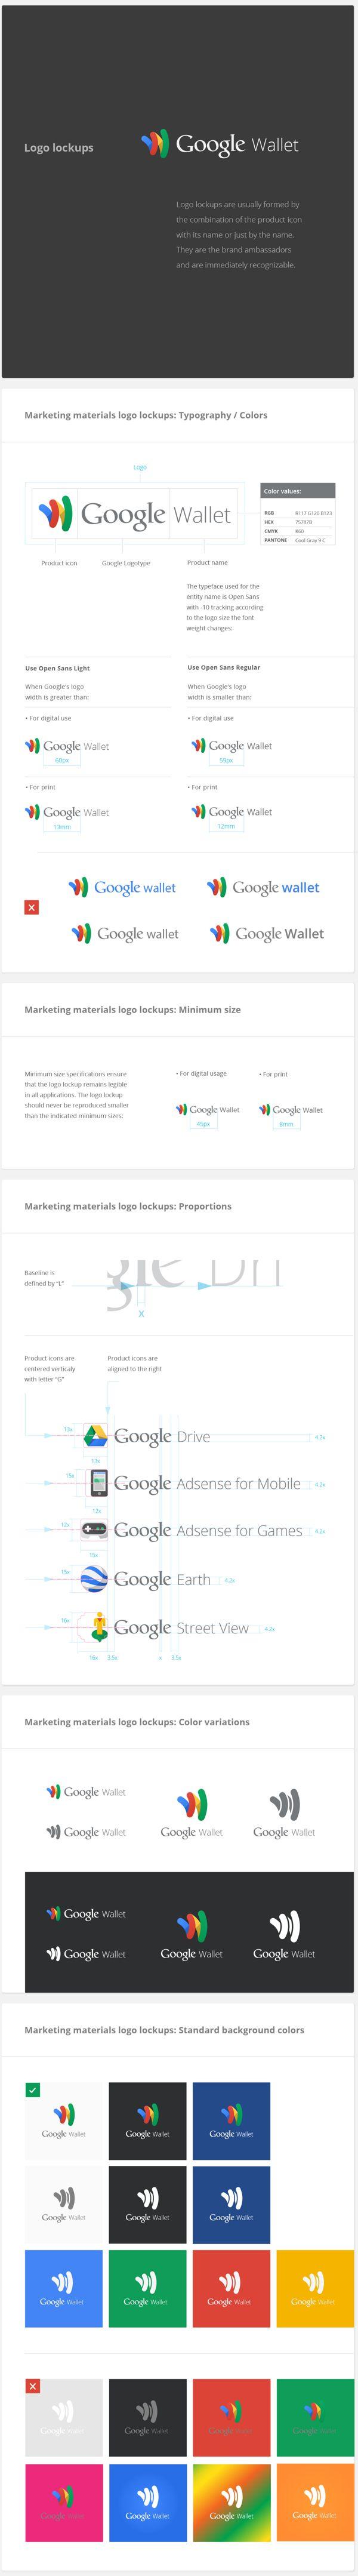 Google Logo Lock-Up Guidelines | service line descriptors, visual identity, logo lock-ups, brand management | #iheartbrand